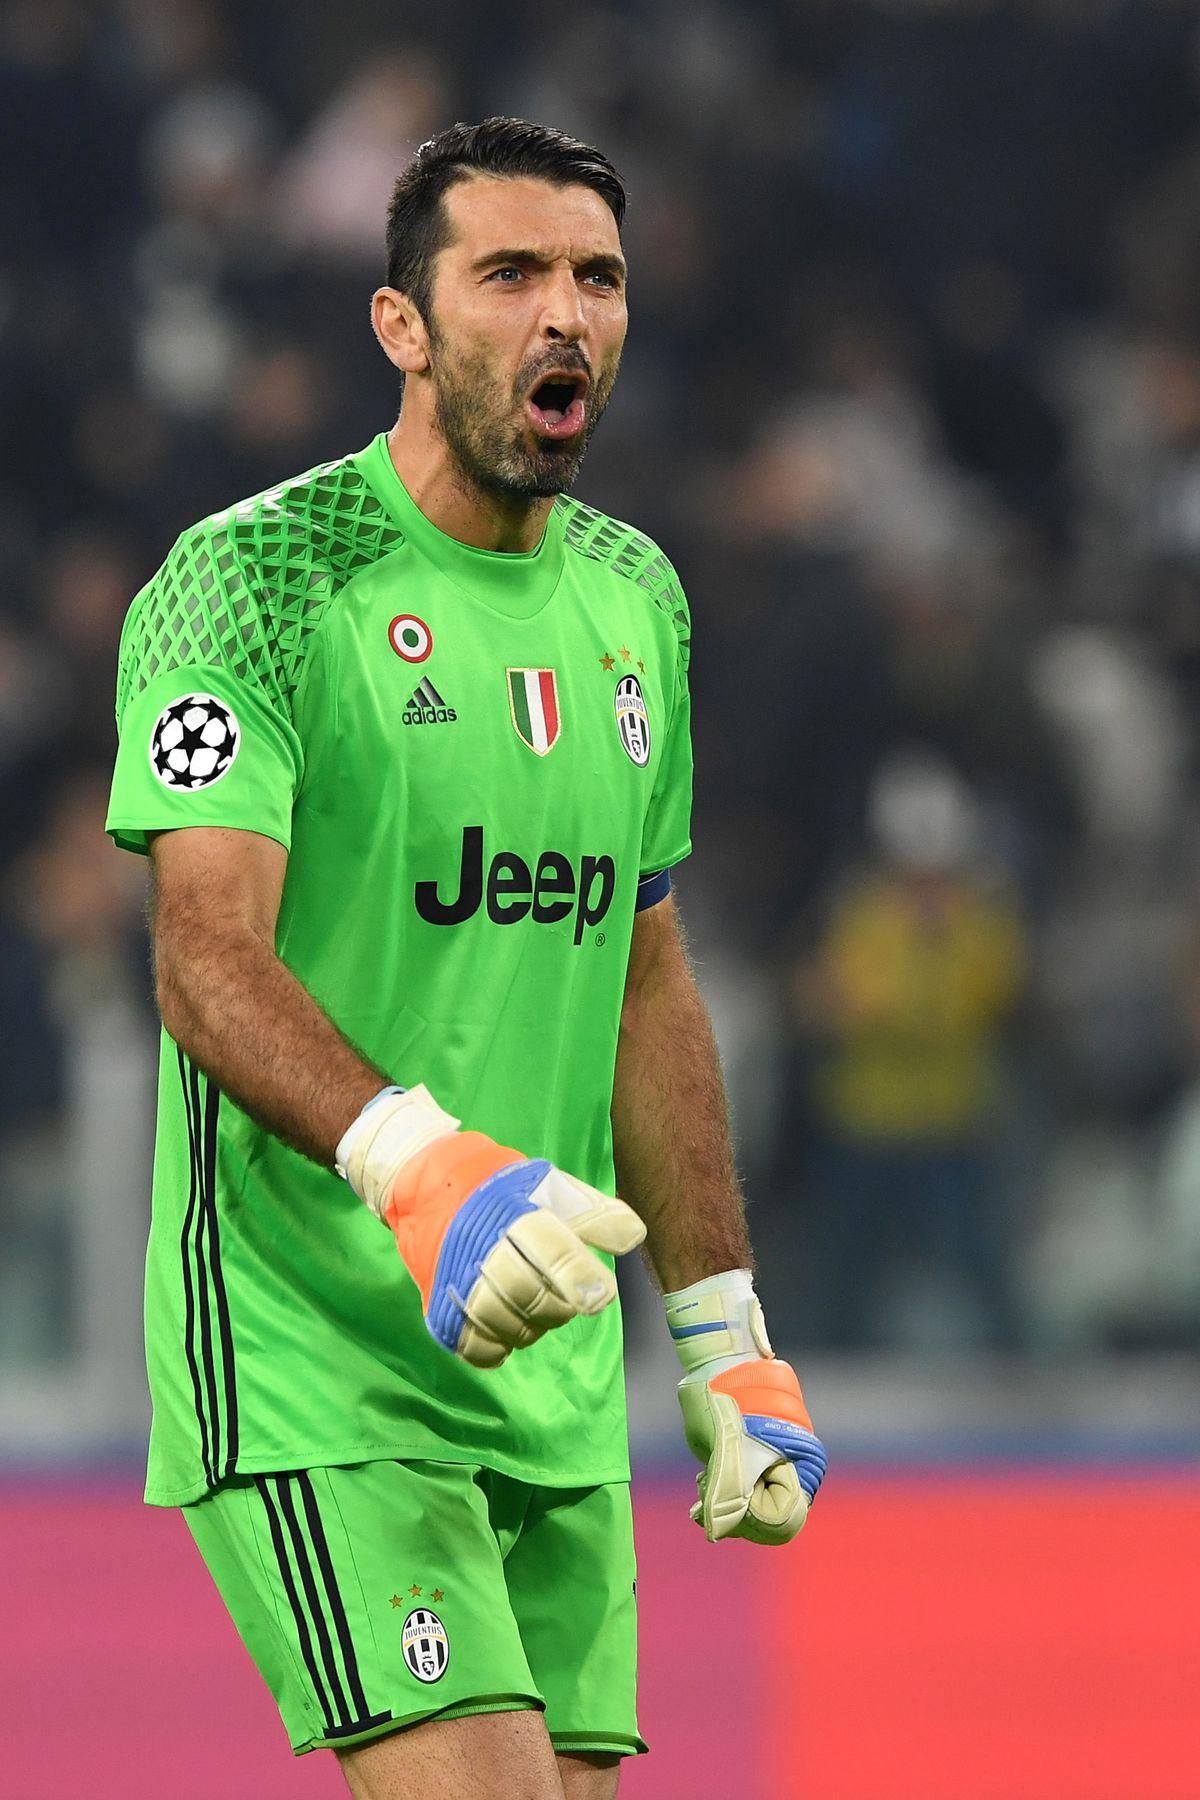 Juventus v Olympique Lyonnais - UEFA Champions League